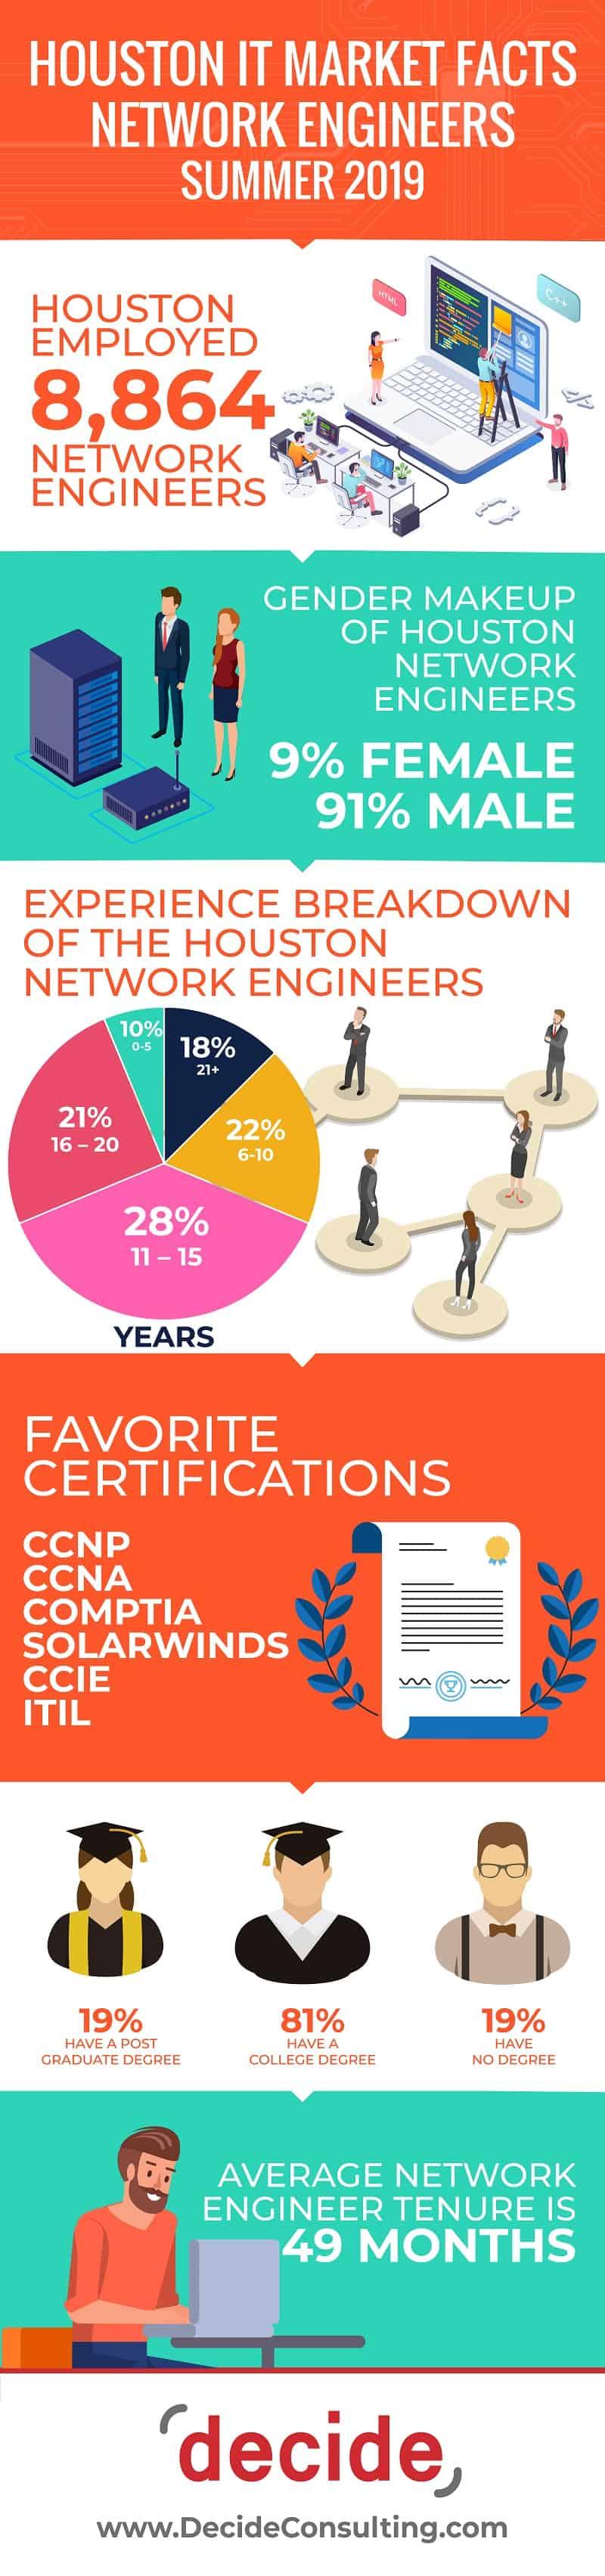 Infographic Houston IT Market Network Engineers